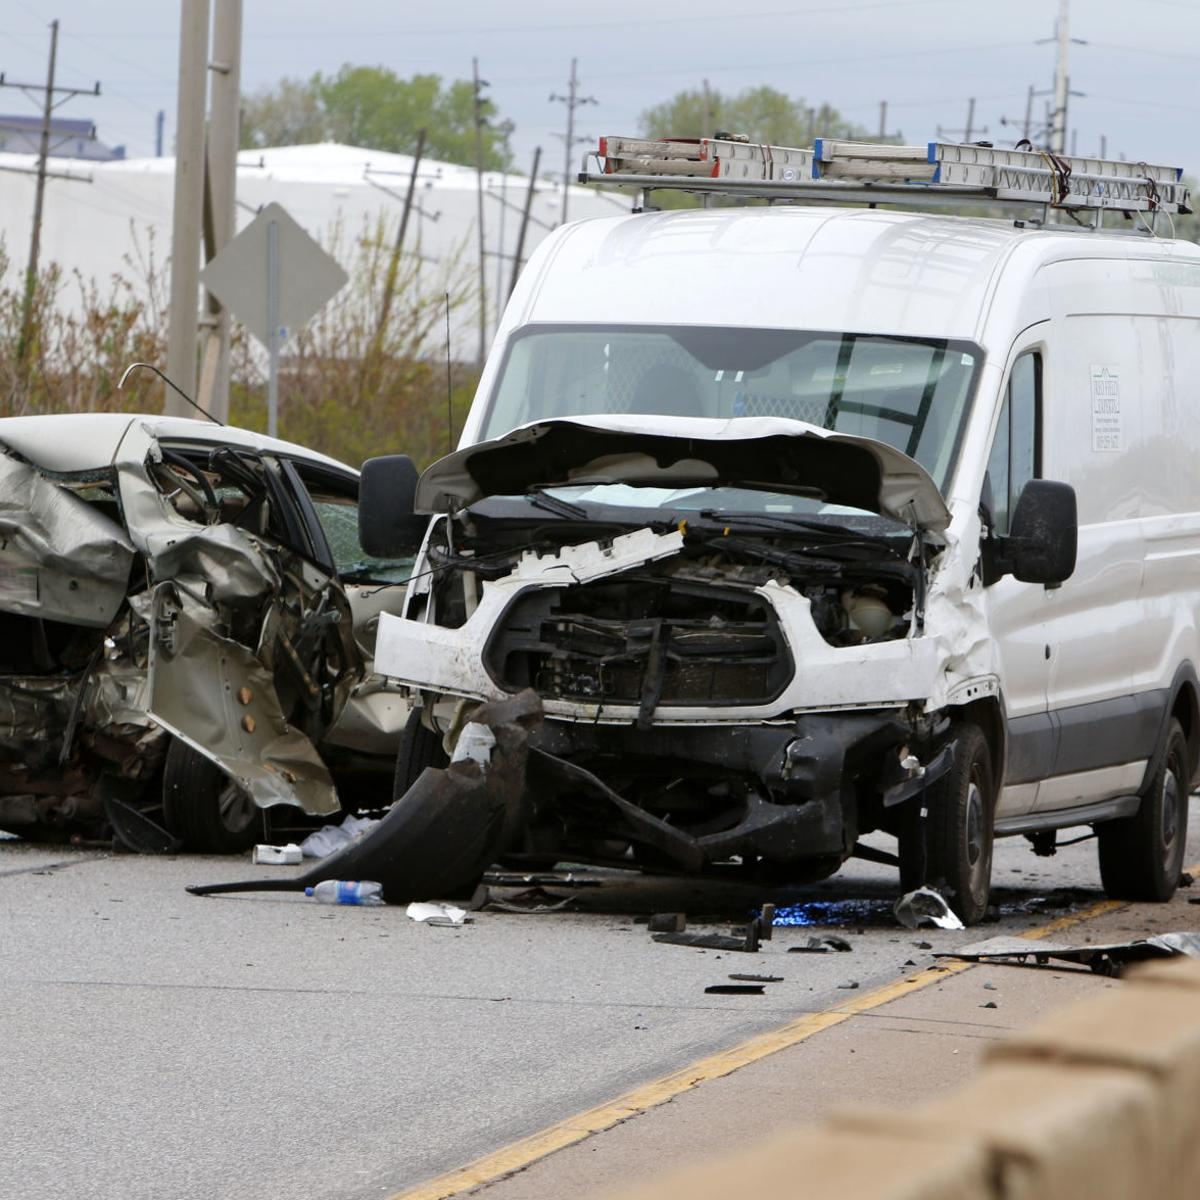 UPDATE: Man killed in 2-vehicle crash on Cline Avenue identified